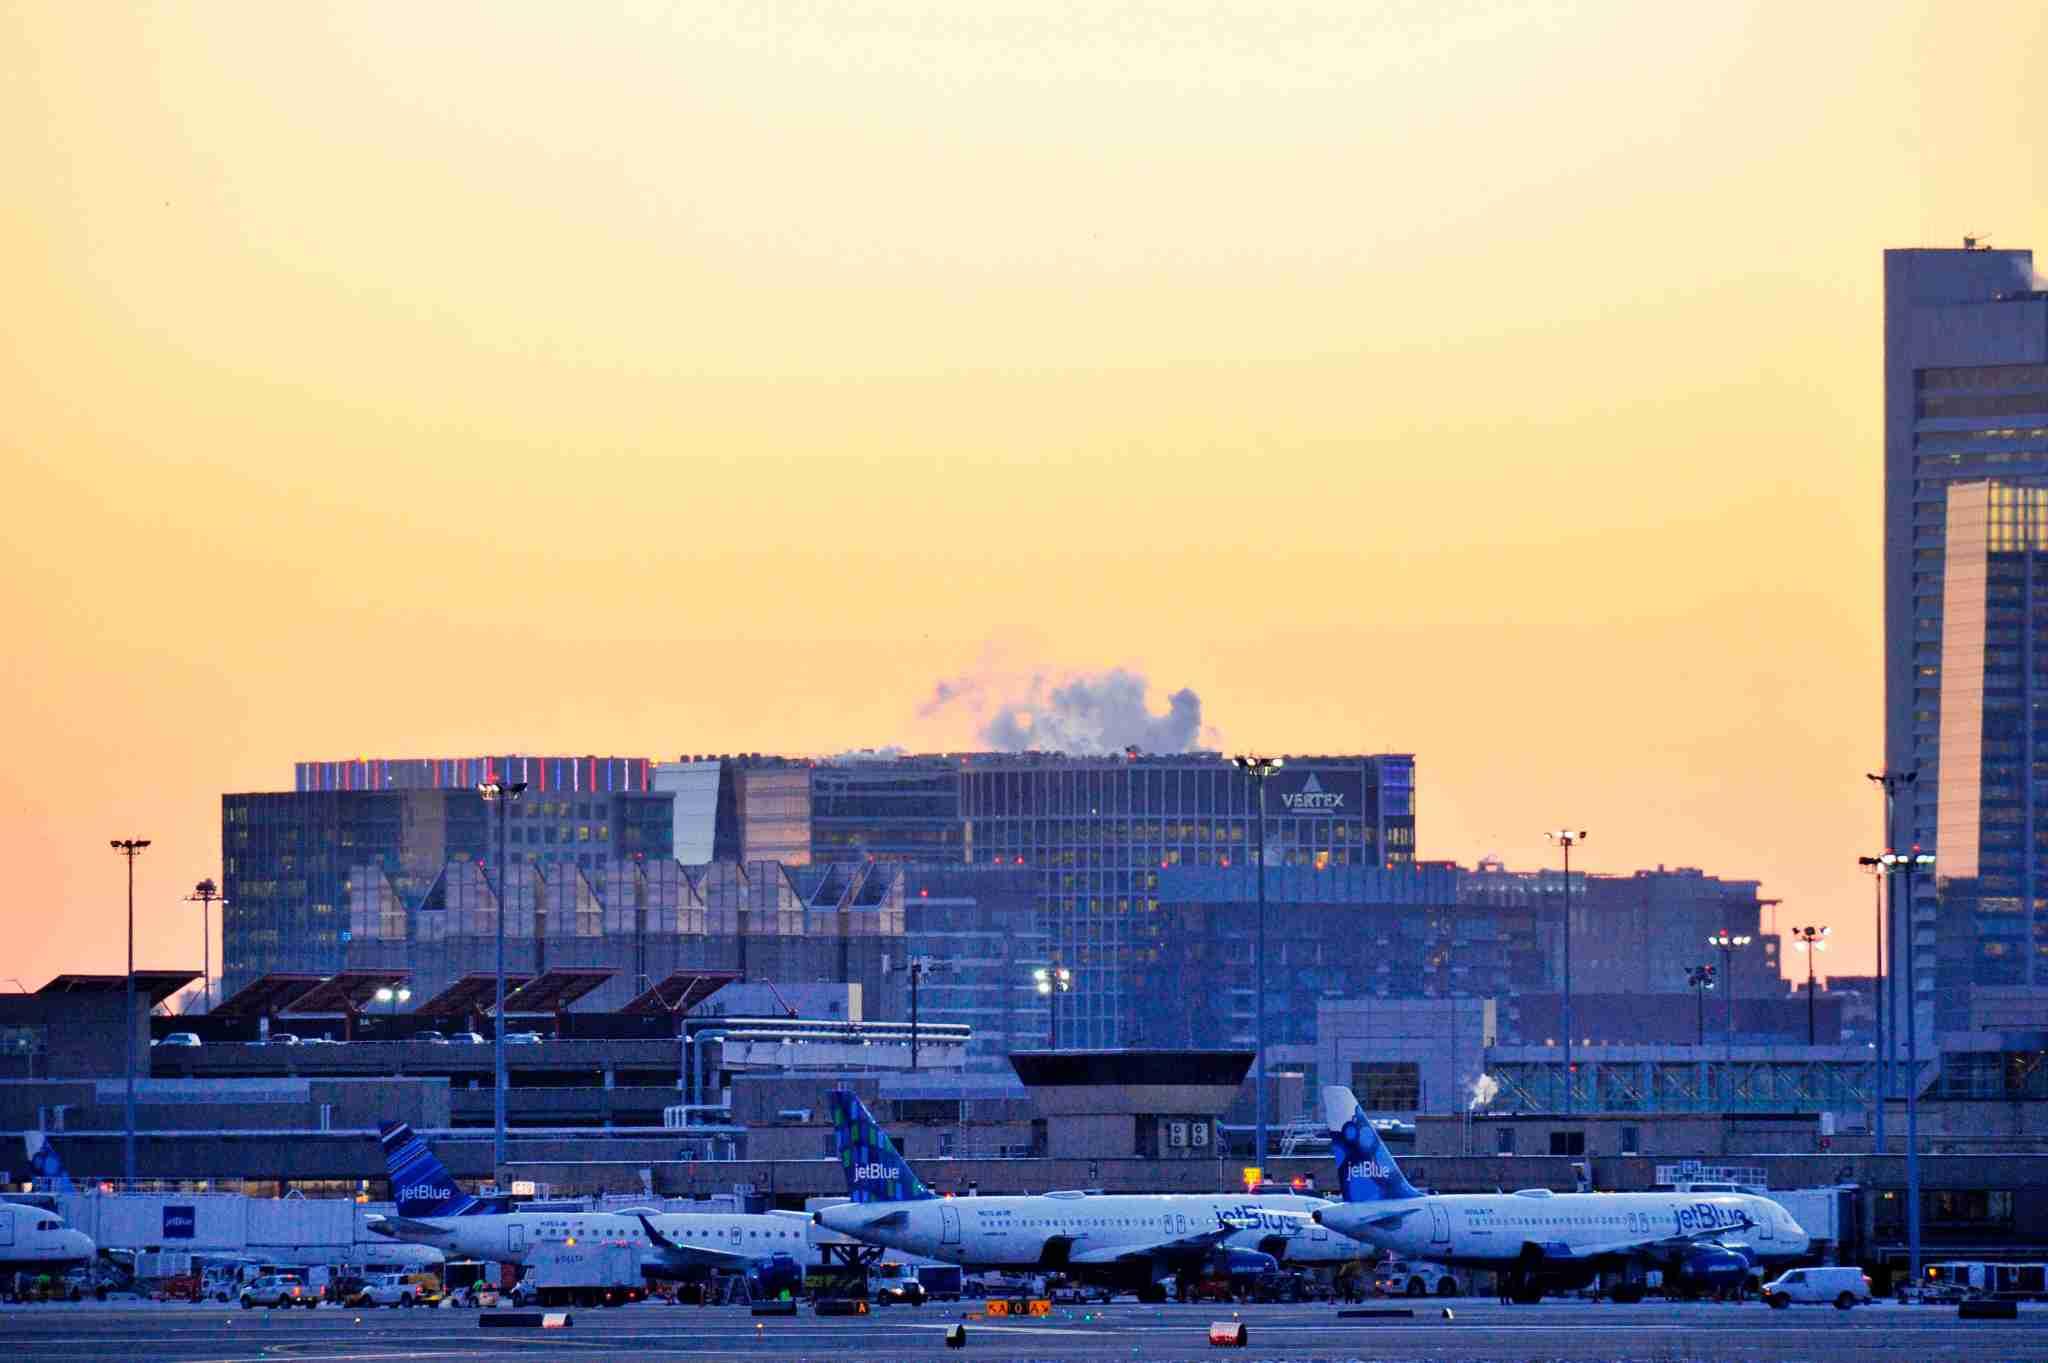 JetBlue aircraft at Boston Logan. (Photo by JOSEPH PREZIOSO/AFP/Getty Images)